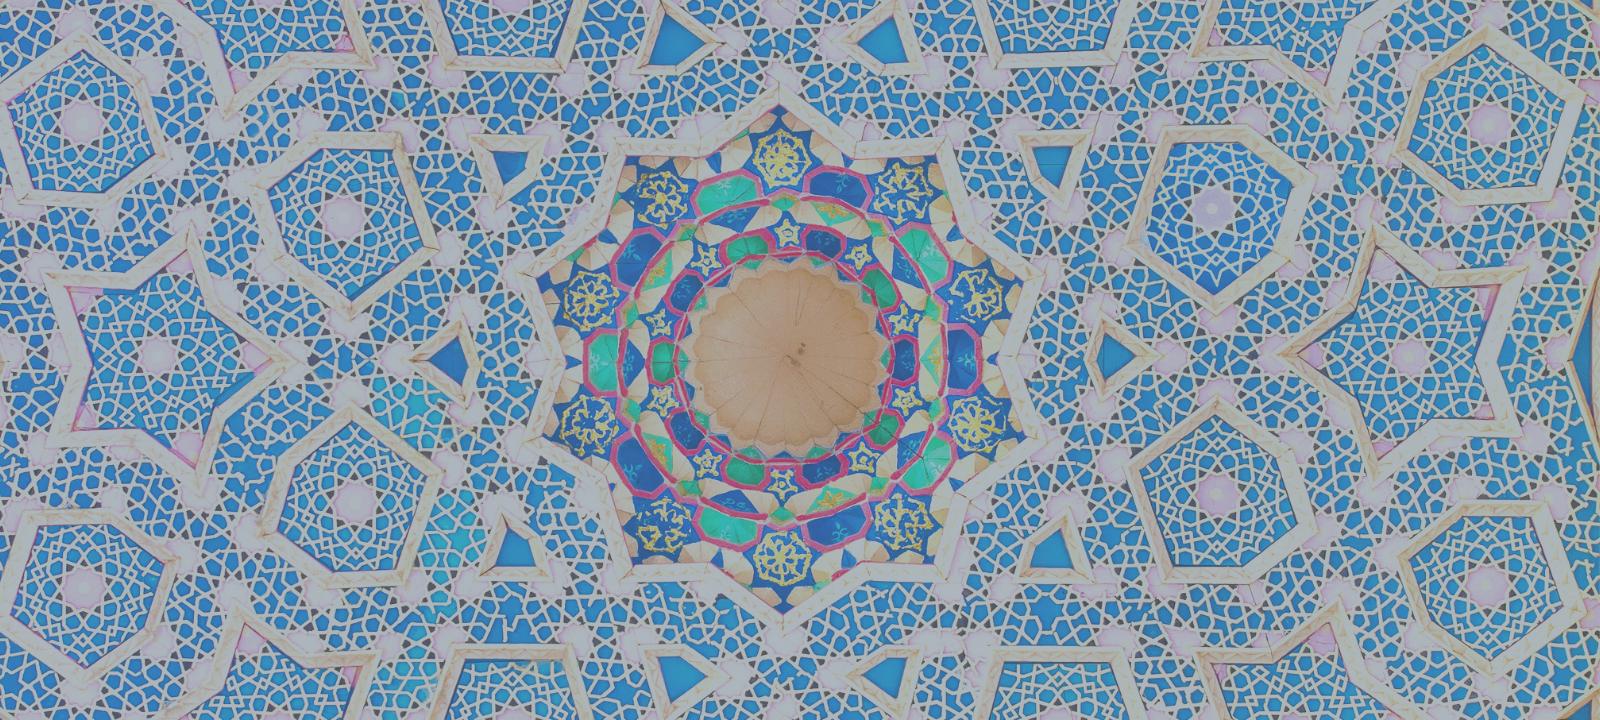 Islamic Arts Festival: December 5 & 6